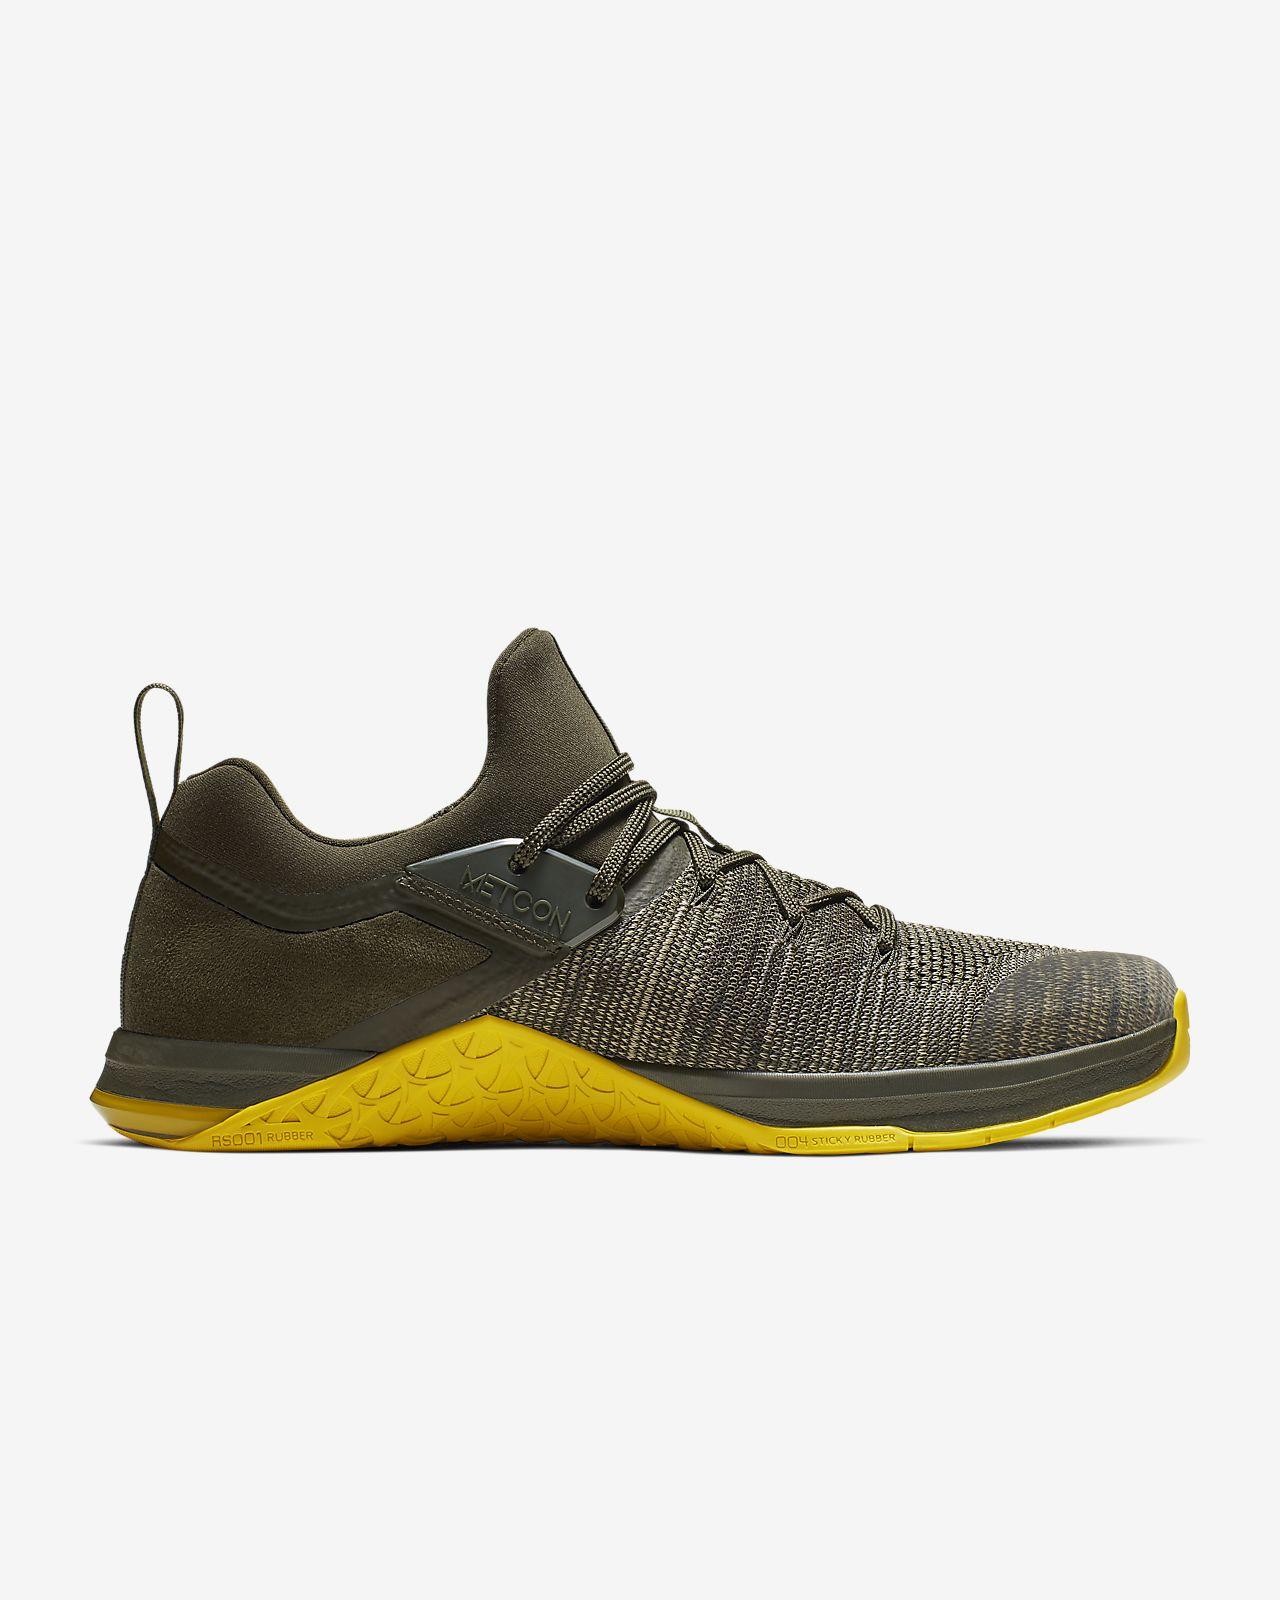 3d8a926f2a854 Nike Metcon Flyknit 3 Men's Cross-Training/Weightlifting Shoe. Nike ...